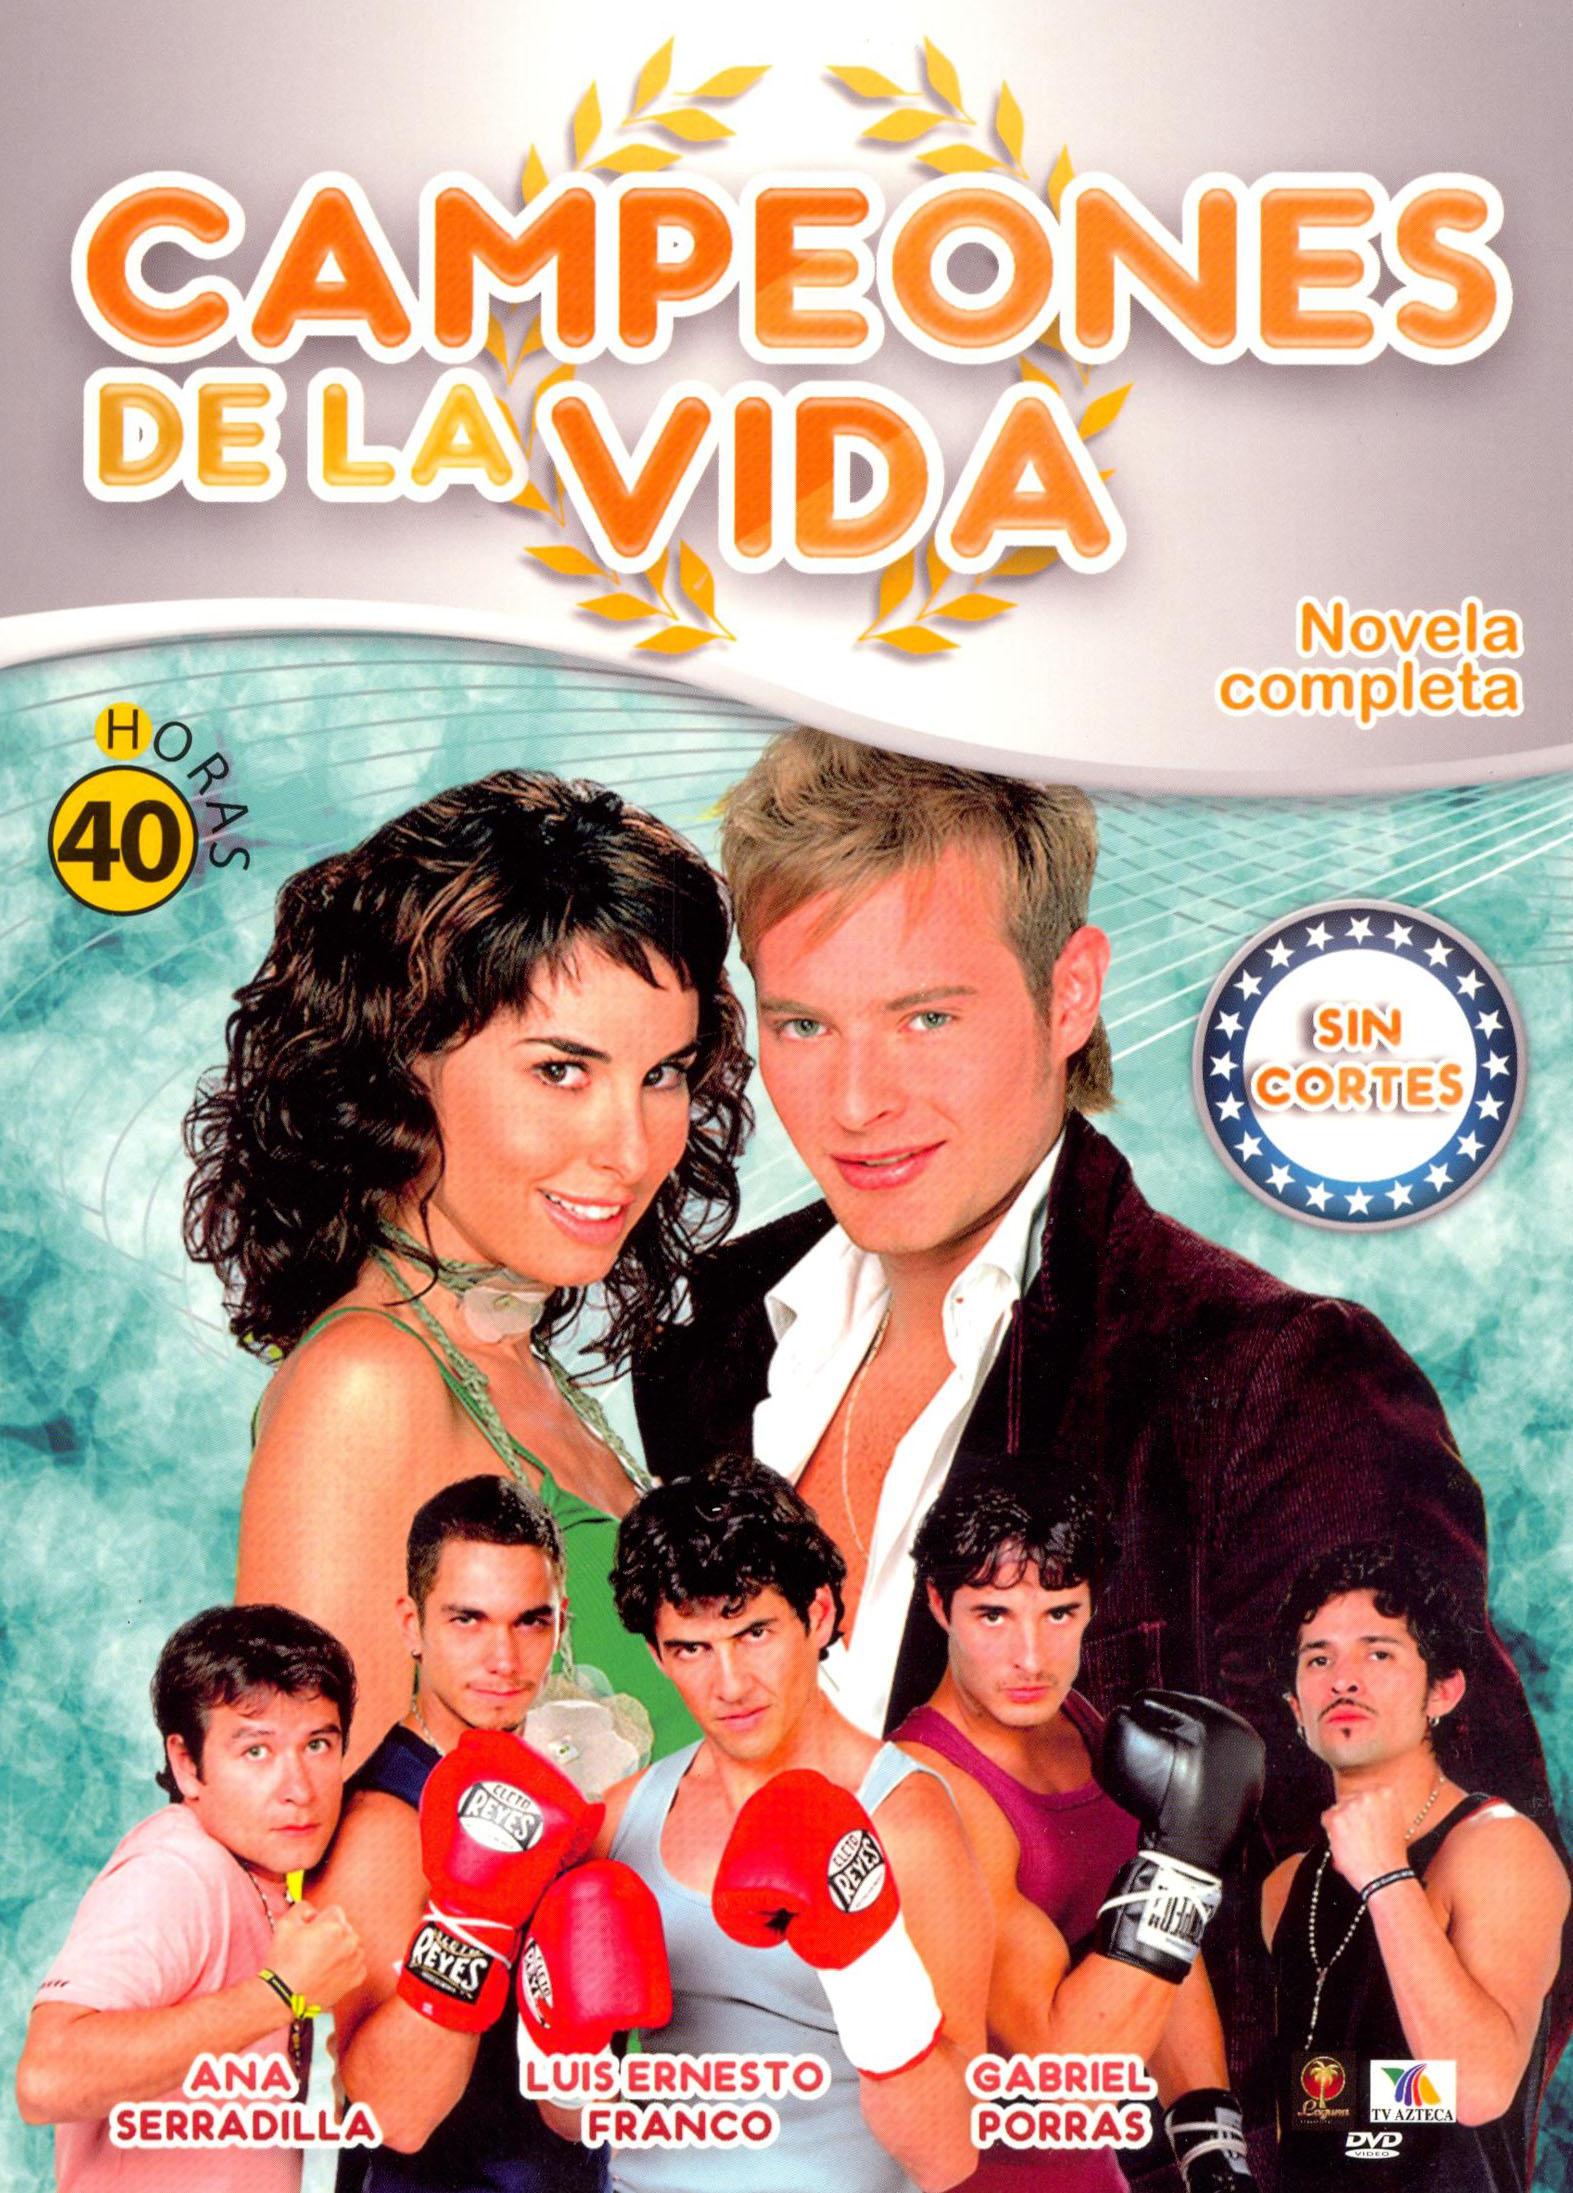 Minerva Ochoa >> Campeones de La Vida - | Cast and Crew | AllMovie